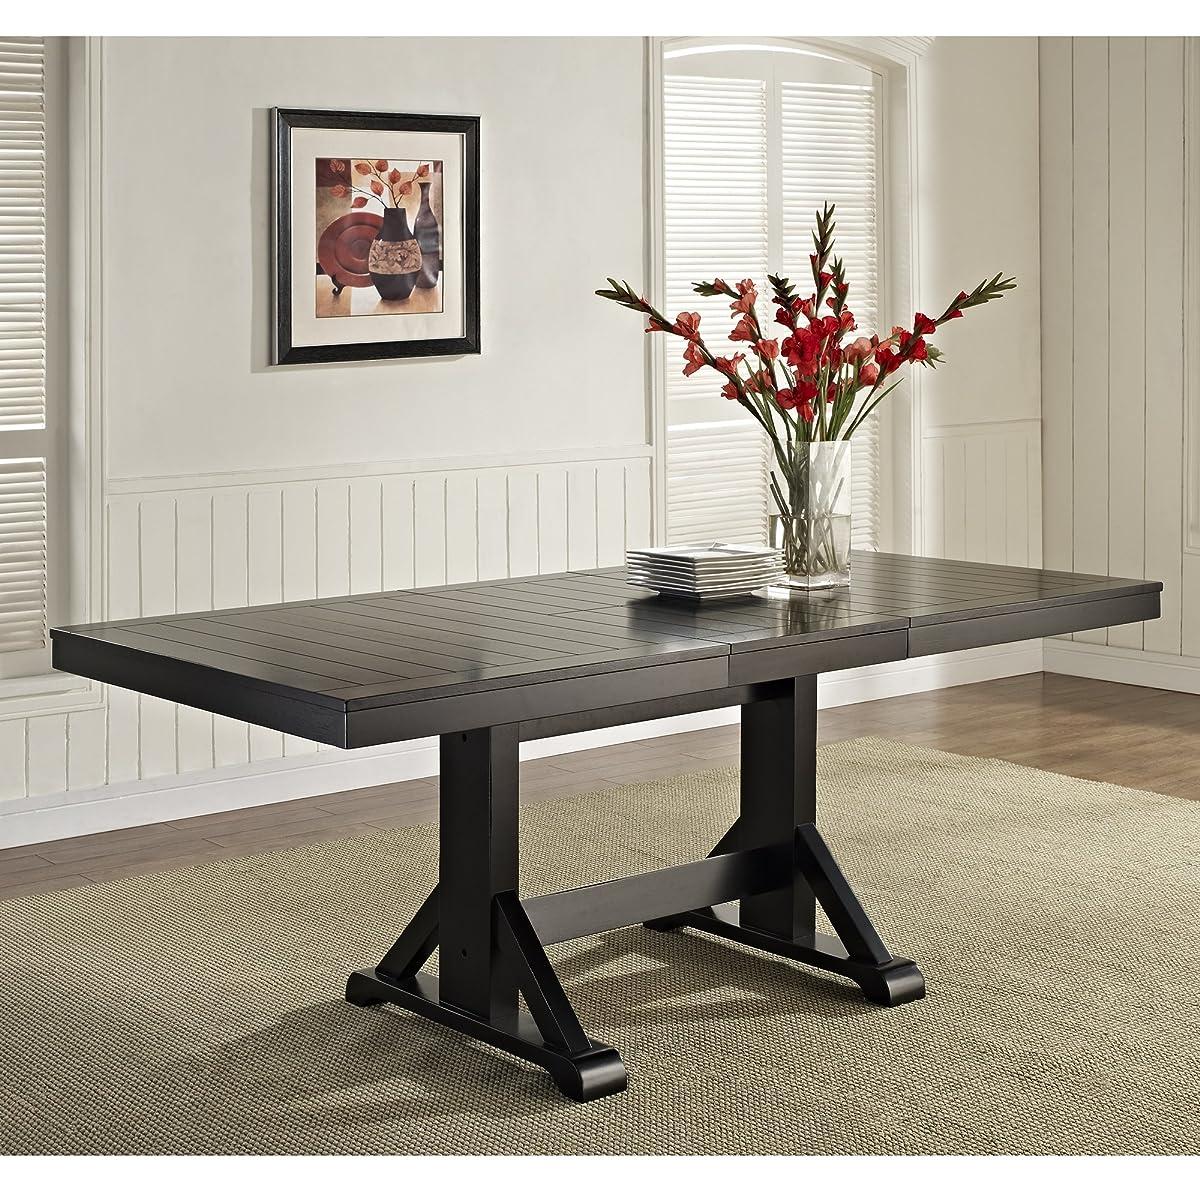 WE Furniture 6-Piece Black Solid Wood Dining Set